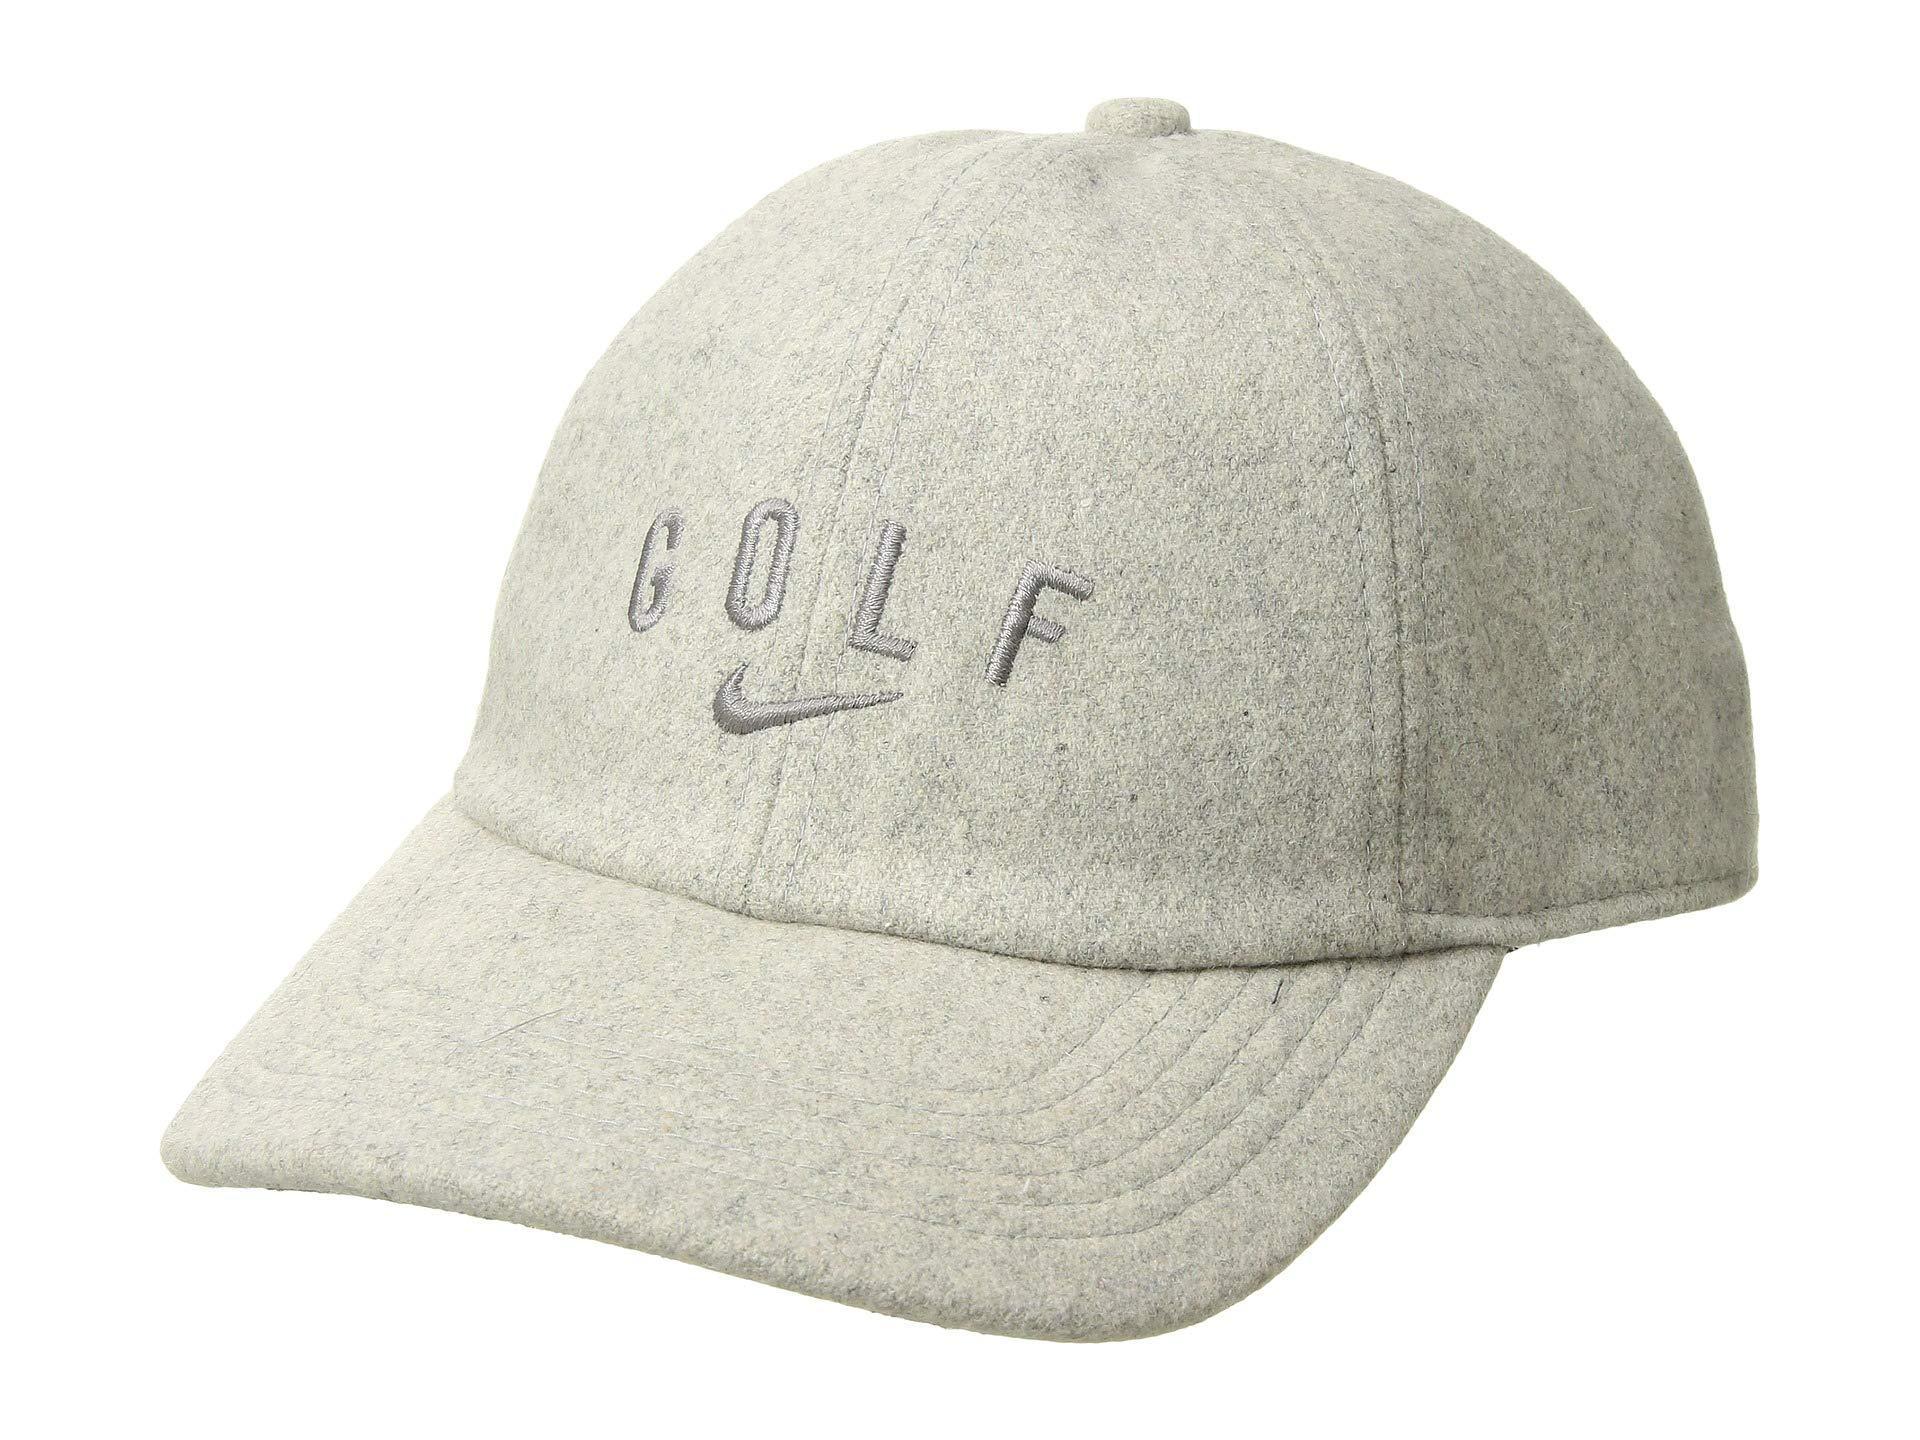 newest d3ac0 e592d Nike. Women s Gray L91 Cap Novelty